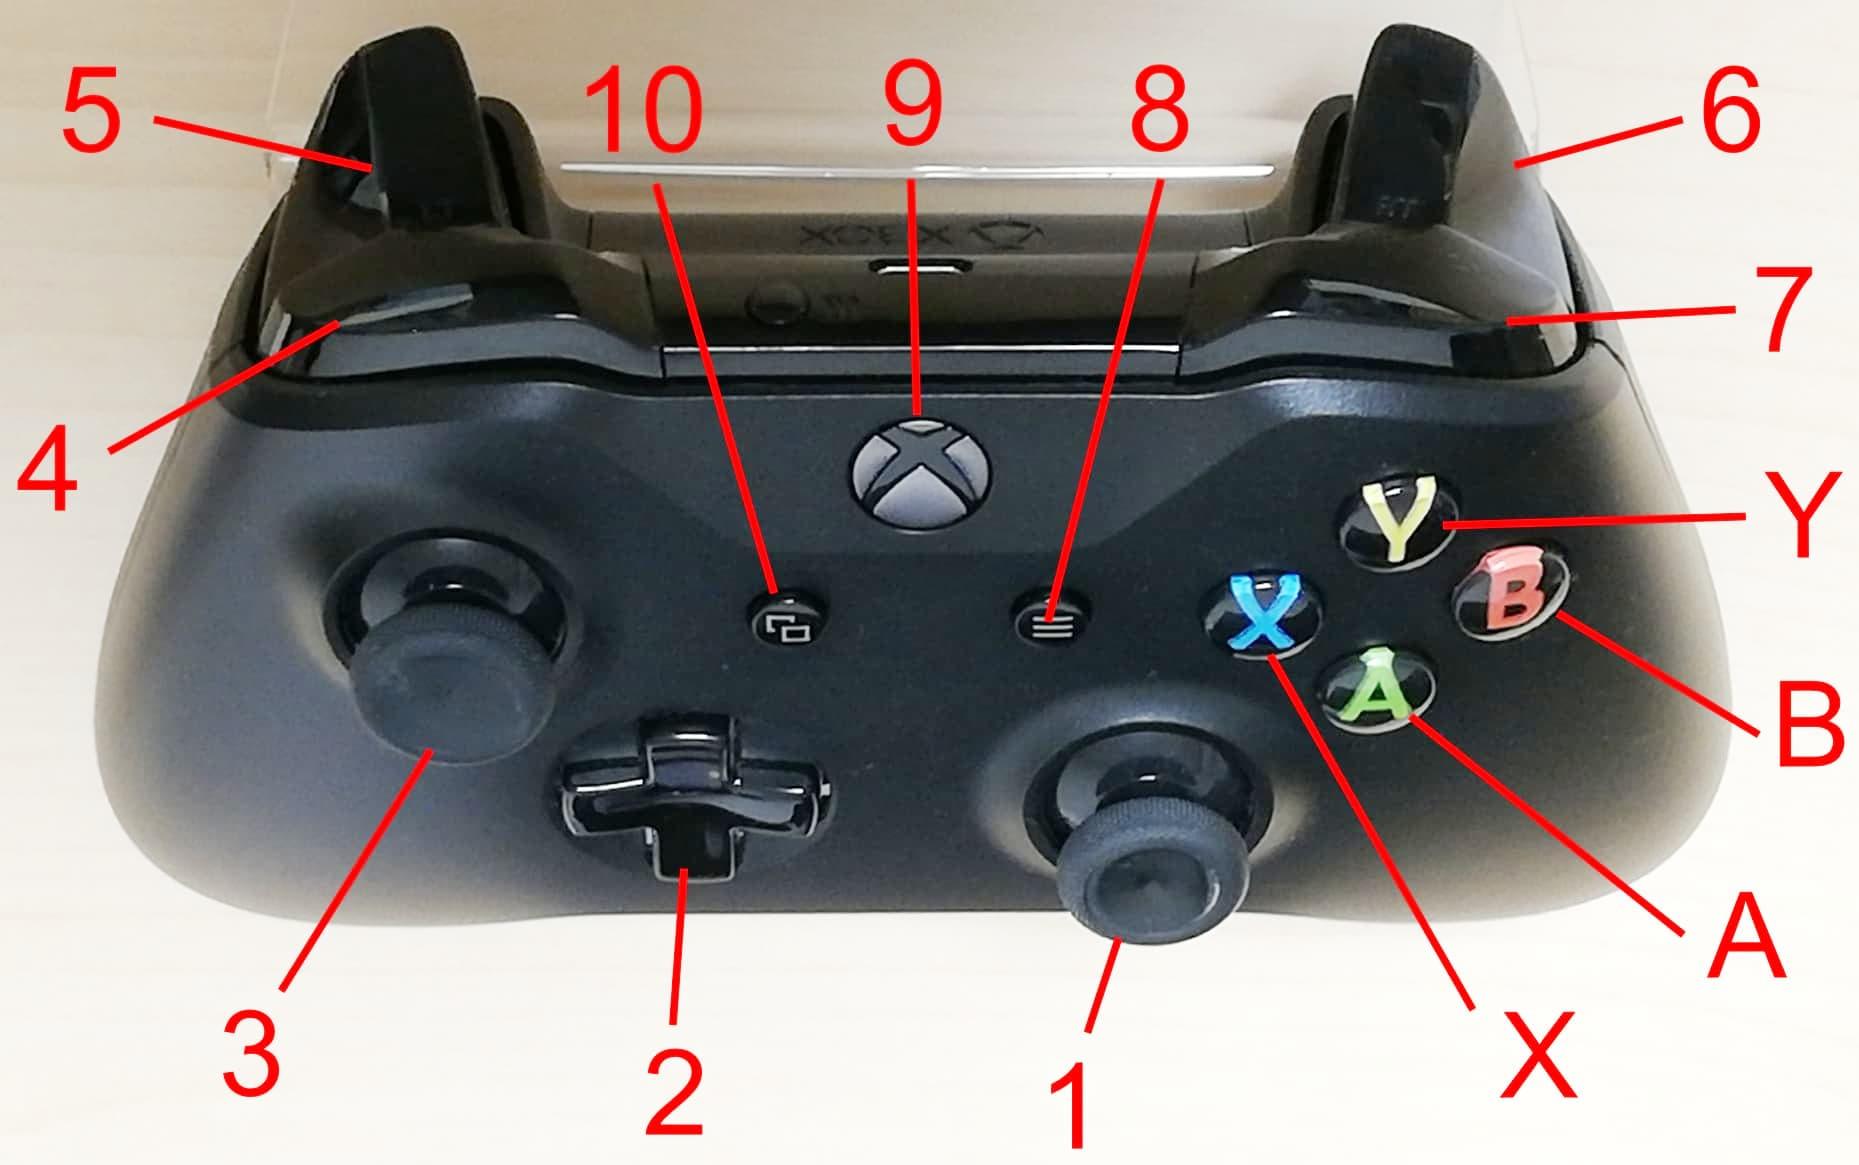 XboxOneコントローラーのボタンに数字を振った画像